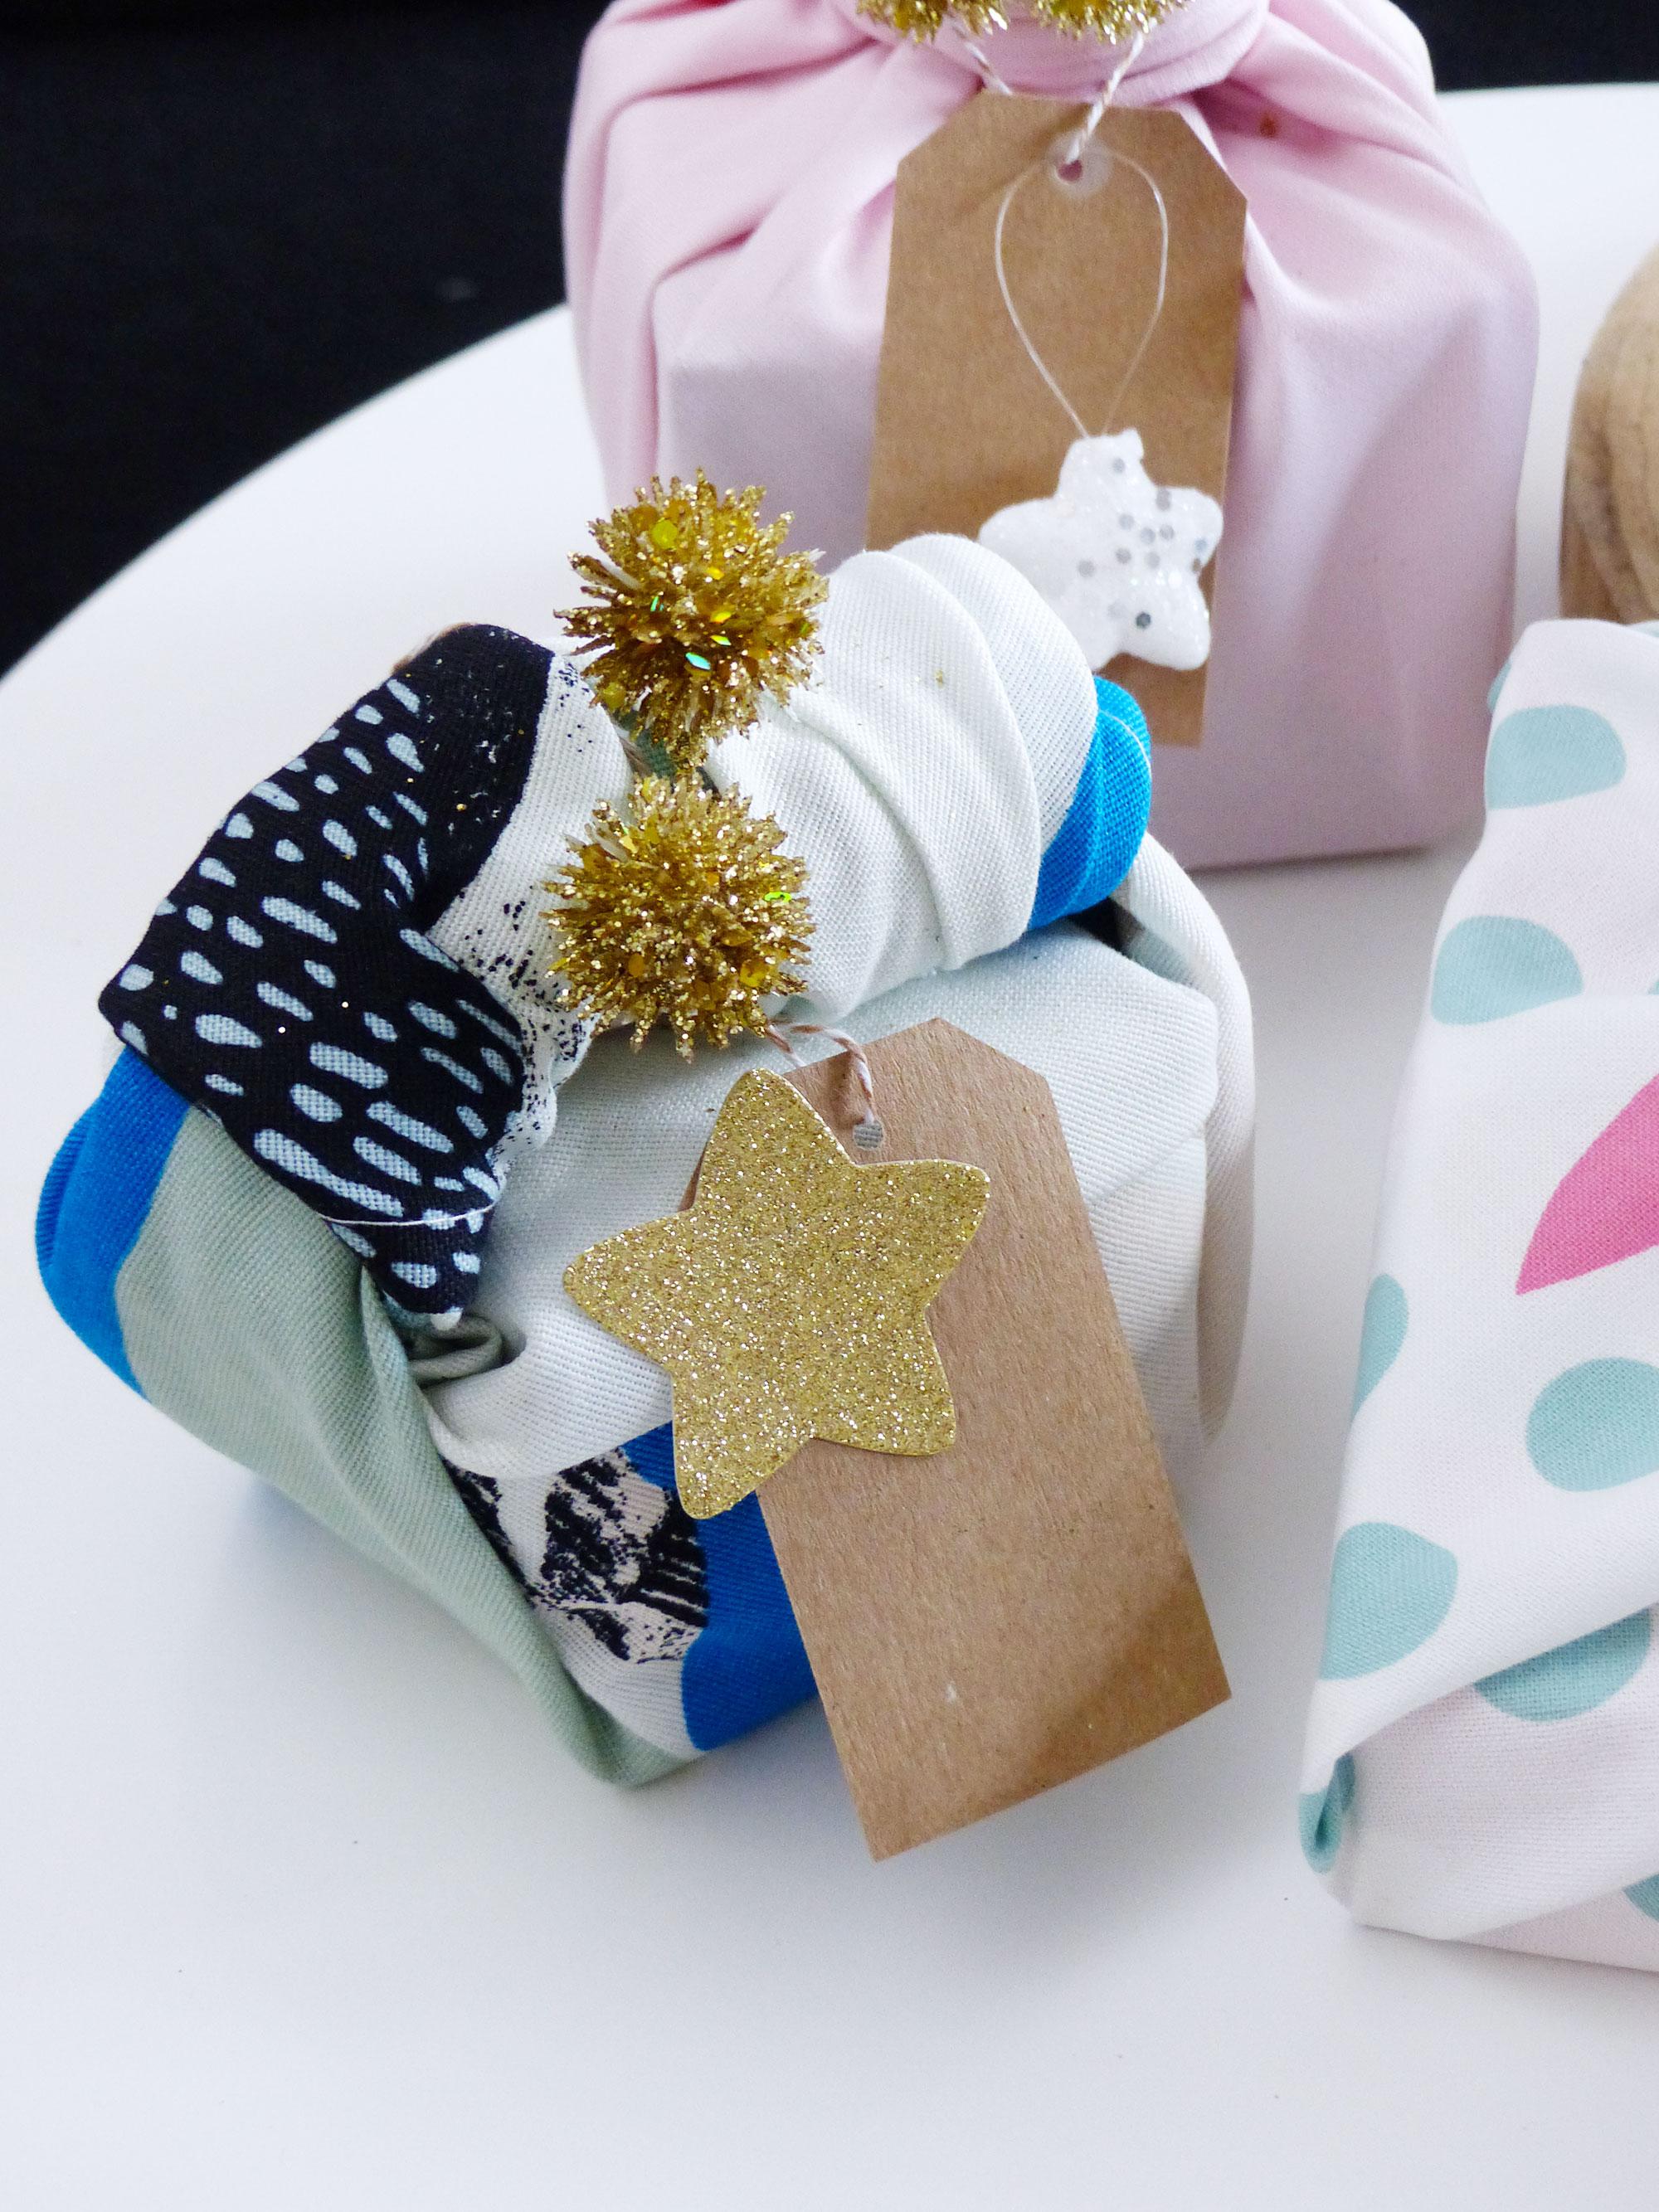 Le furoshiki, emballage cadeau de Noël - Autour de Marine